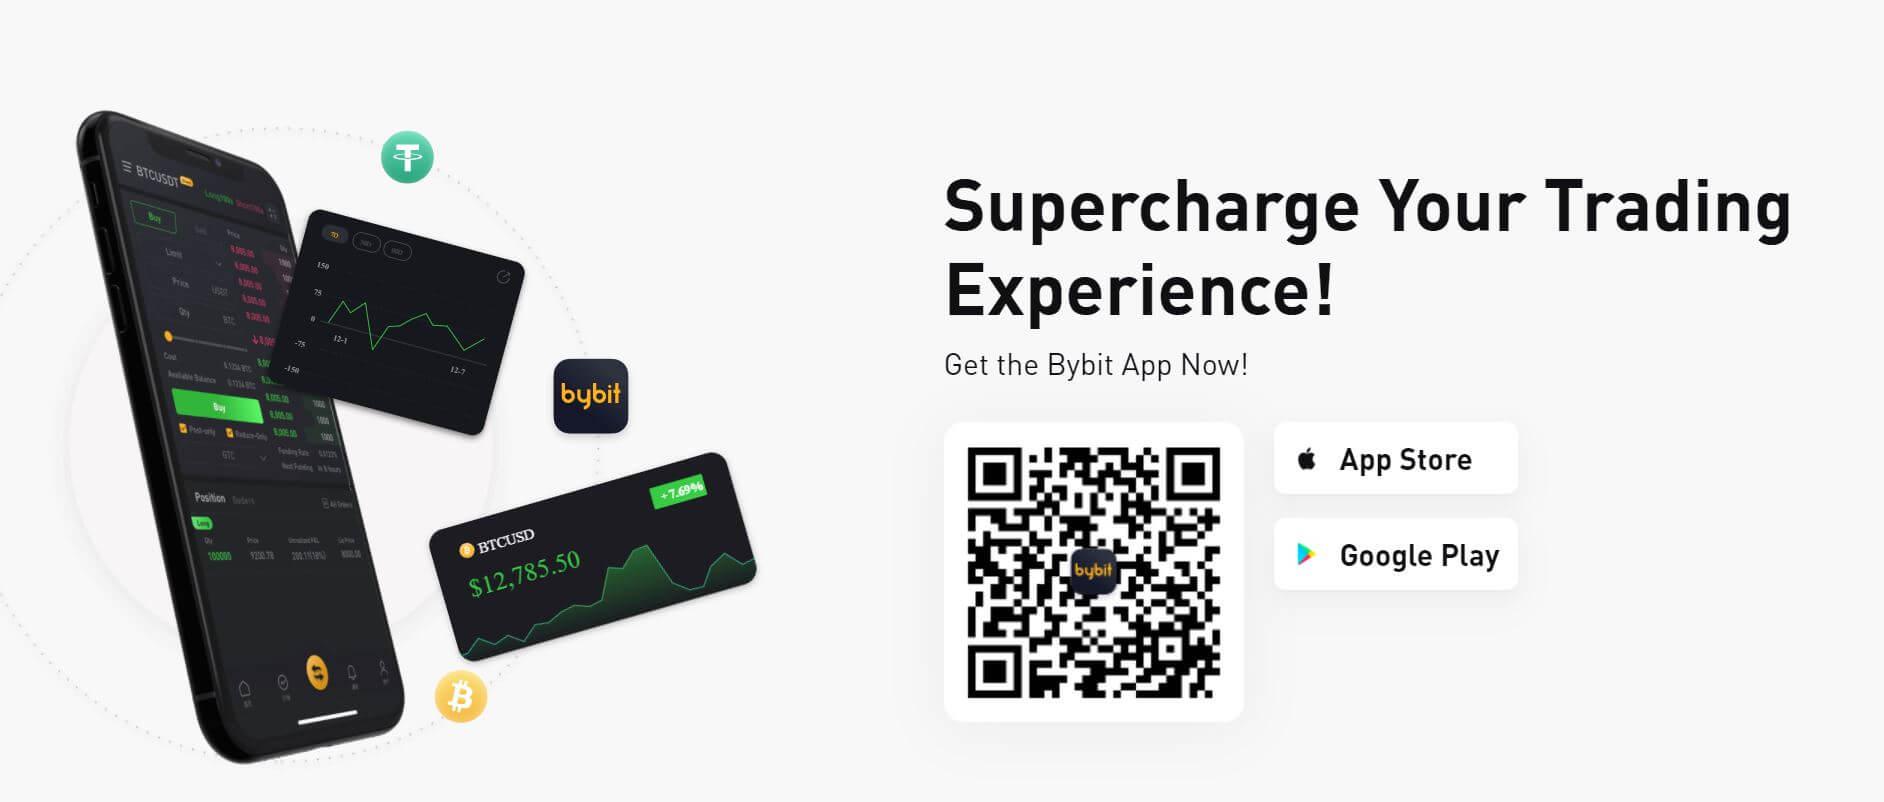 The Bybit App